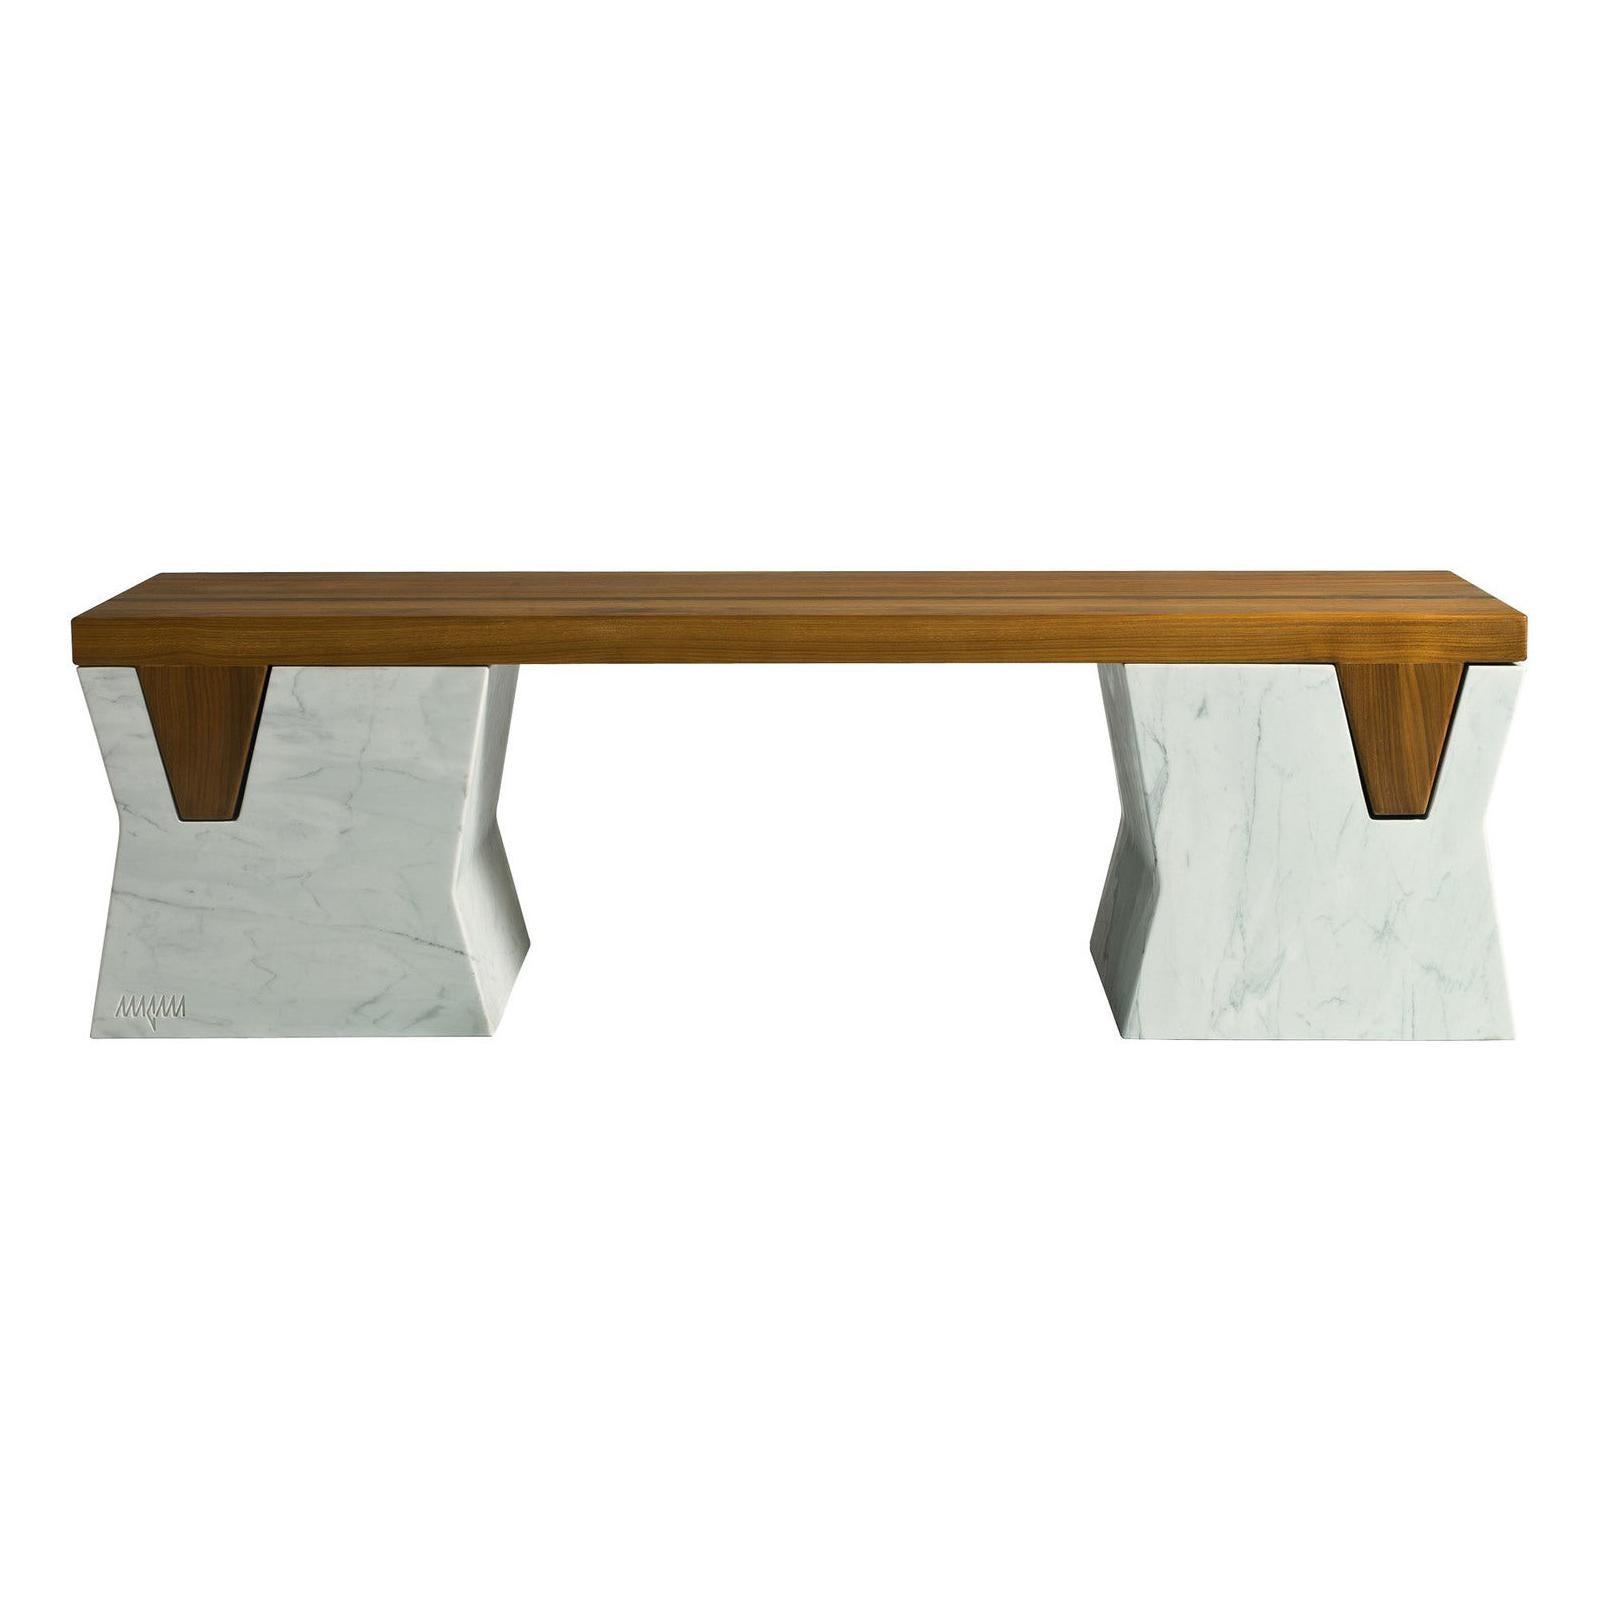 Plaza Bench by Paolo Salvadè by MGM Marmi & Graniti